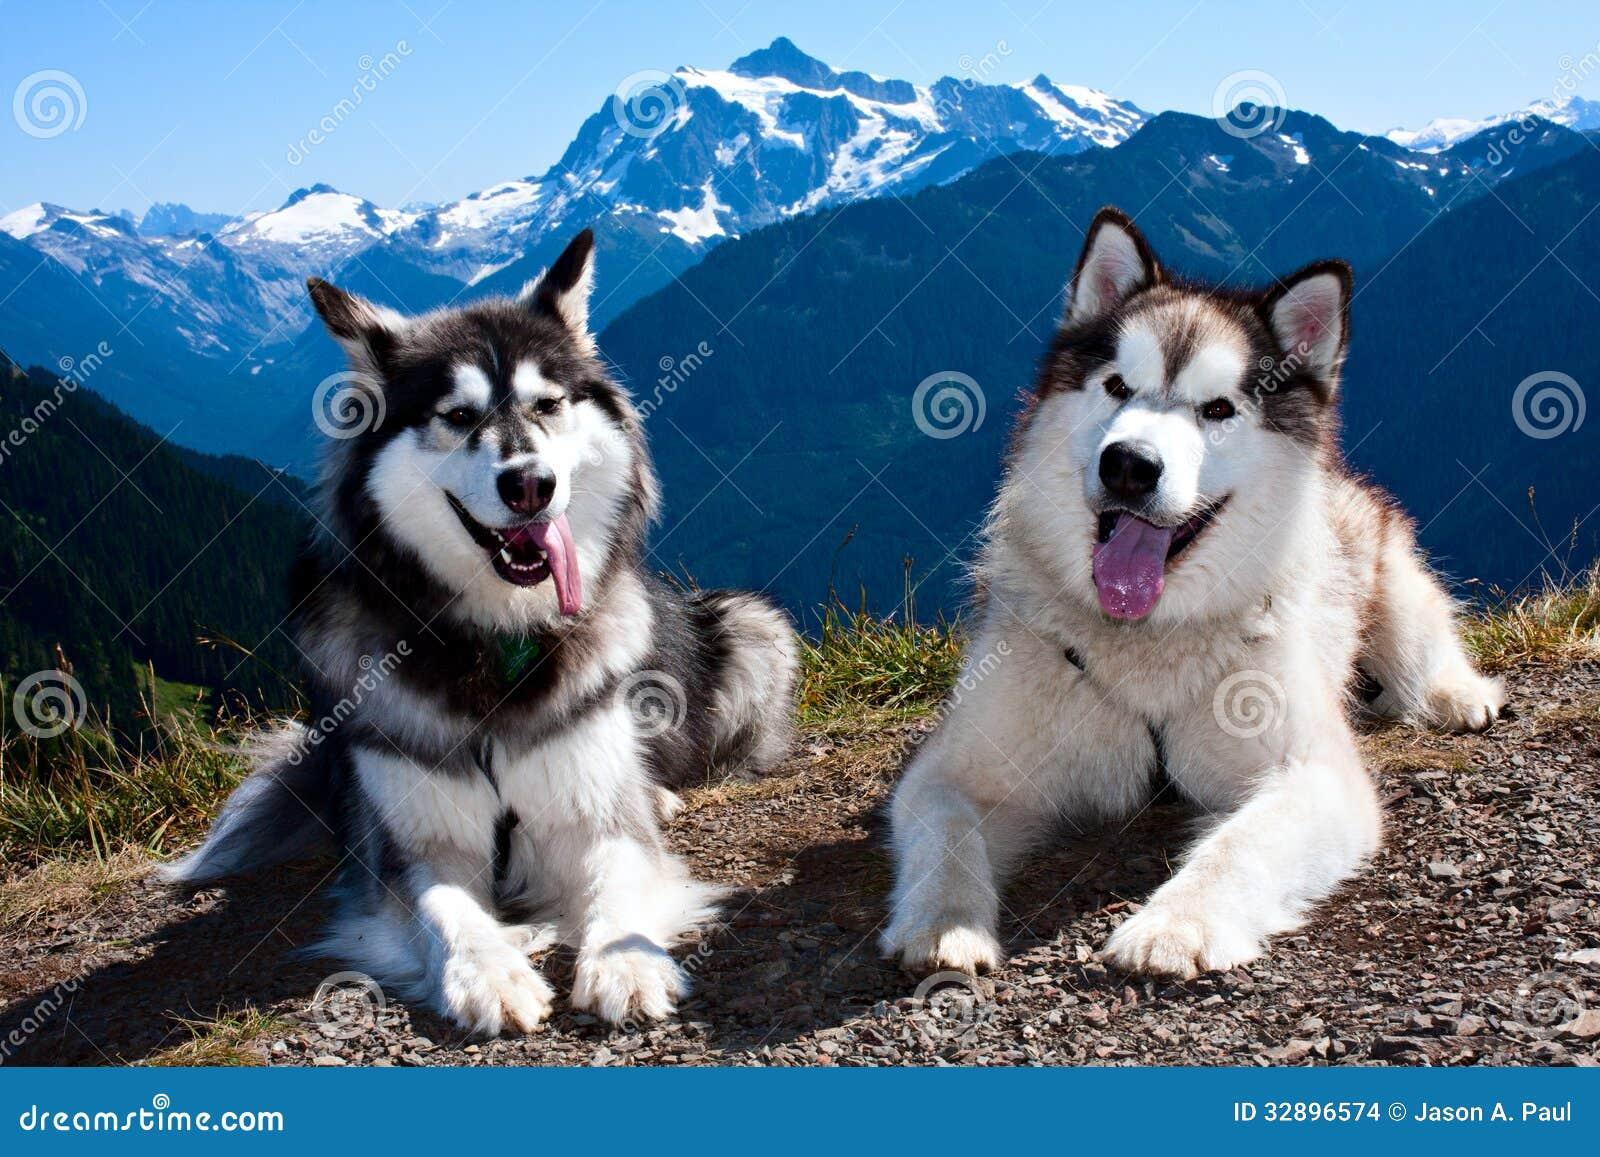 Giant Alaskan Malamute Dogs For Sale